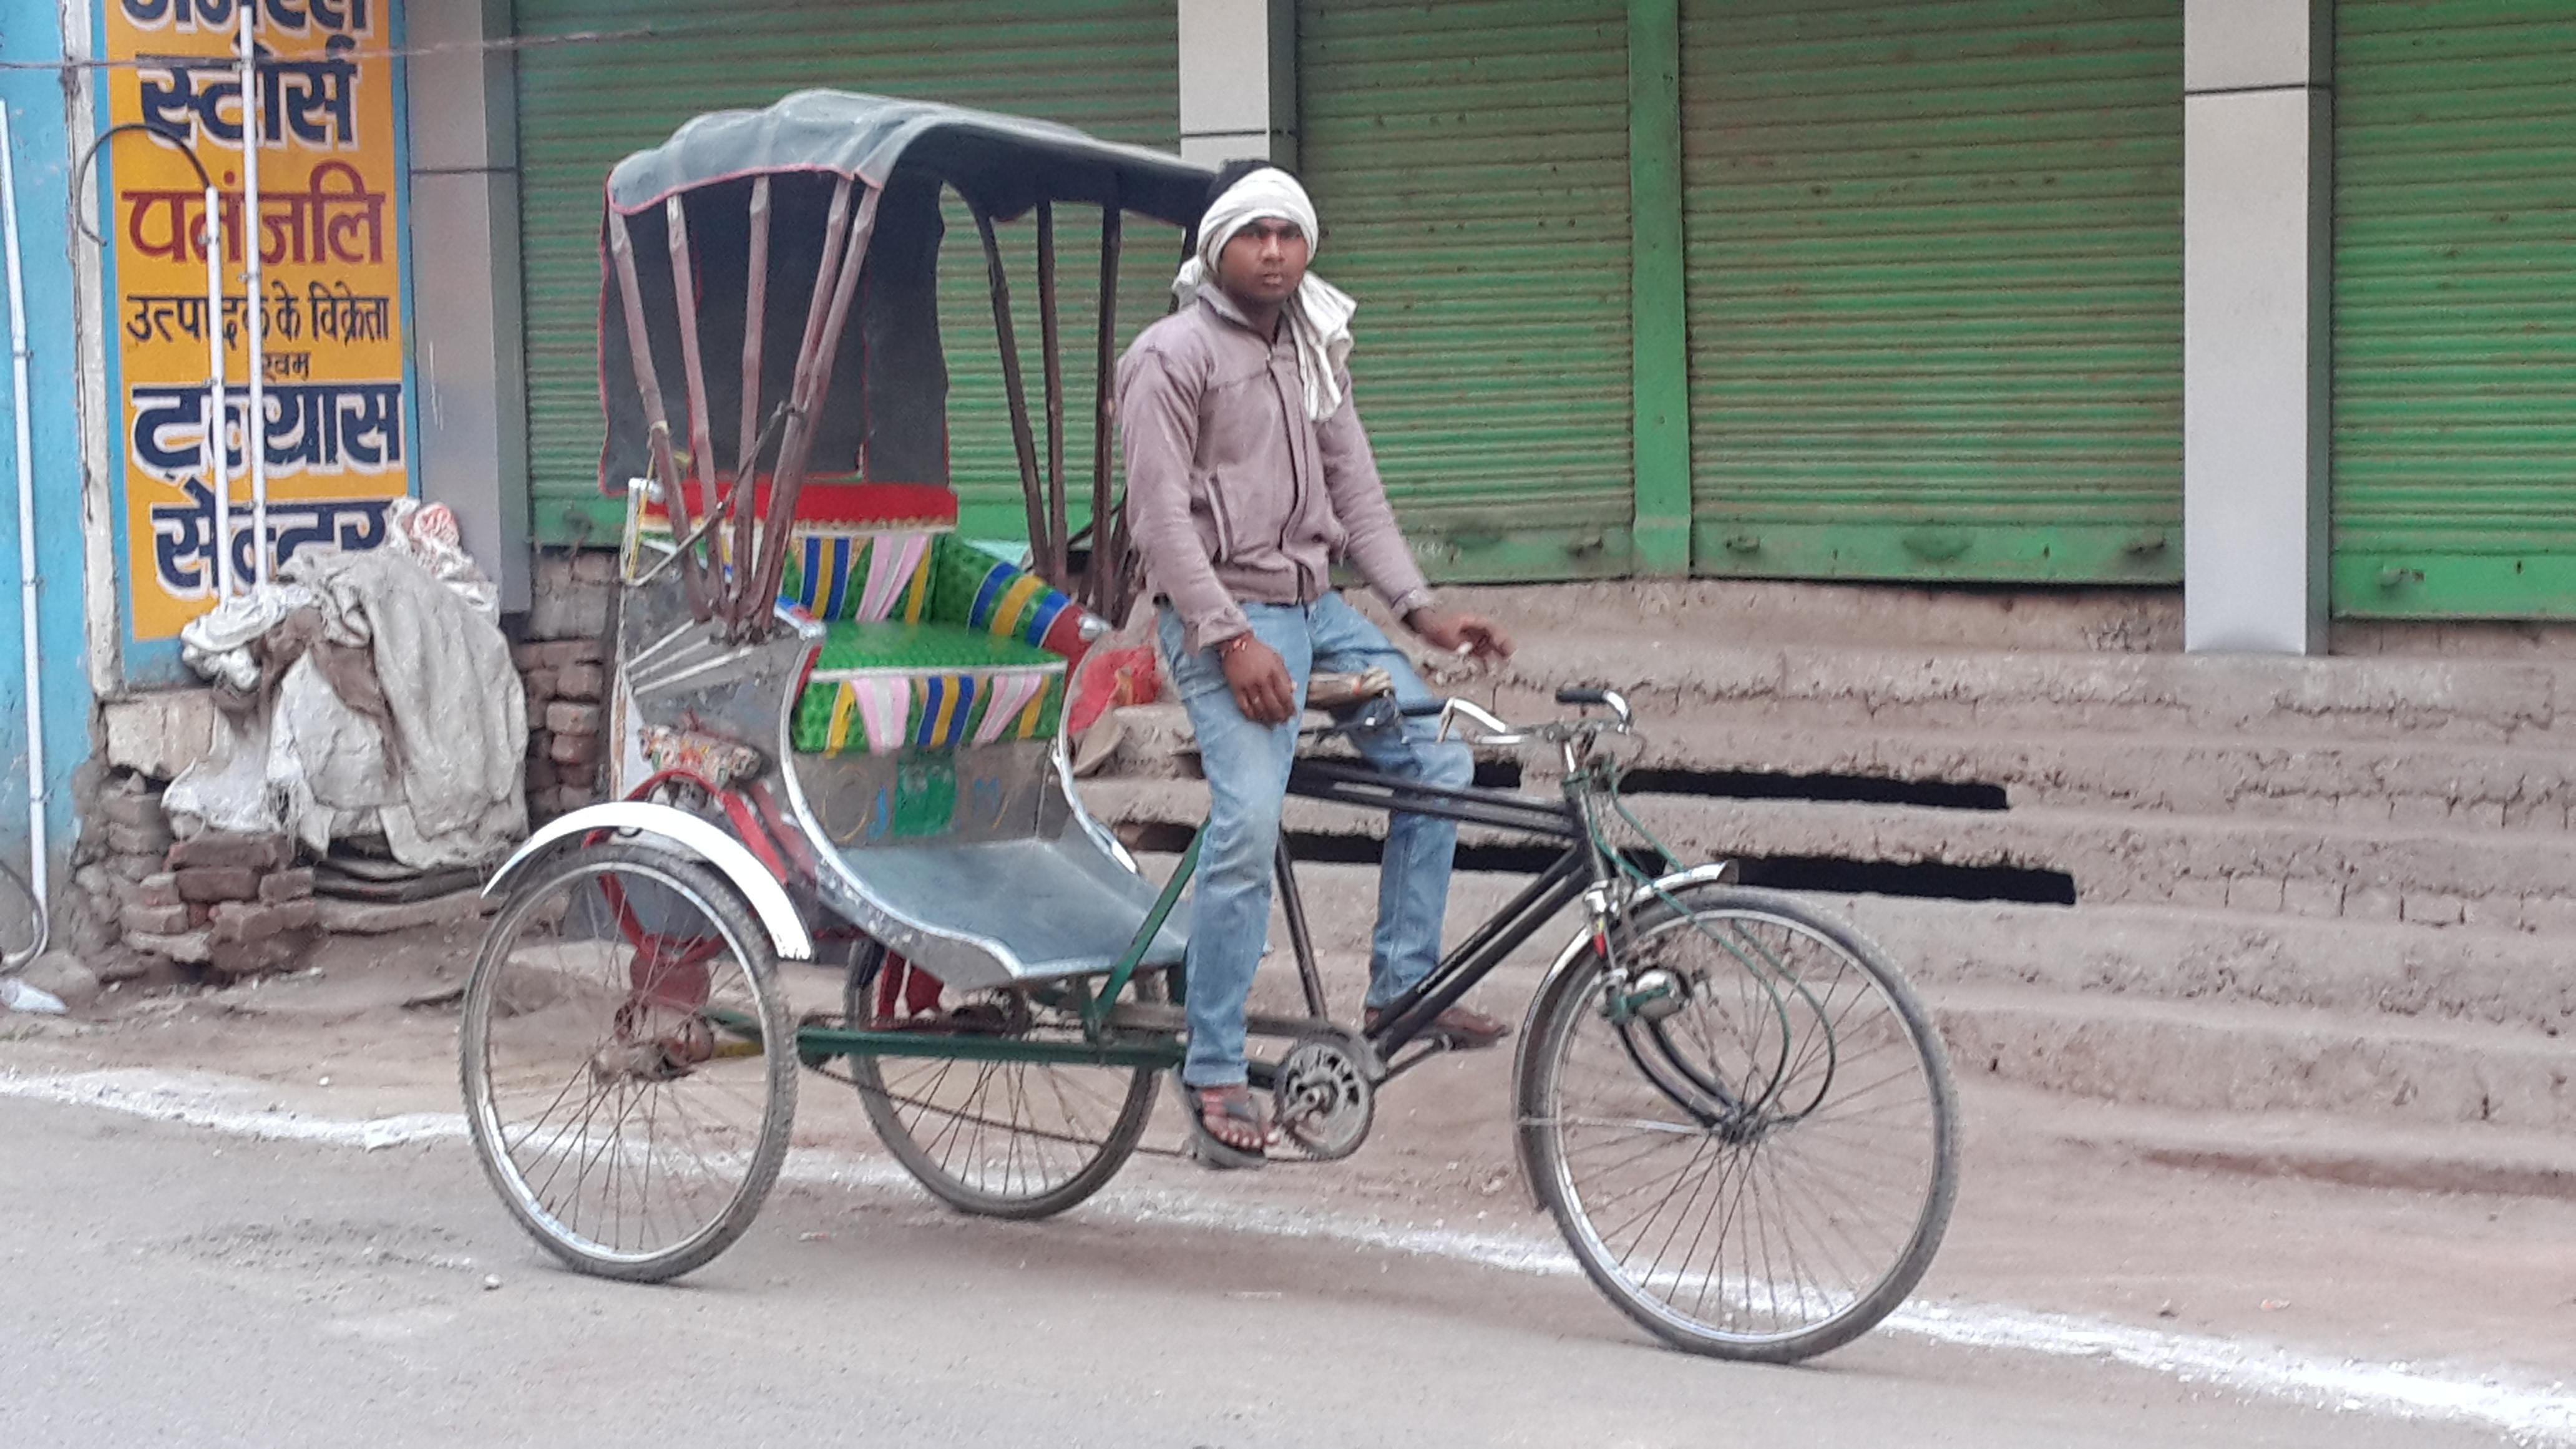 A Rickshaw